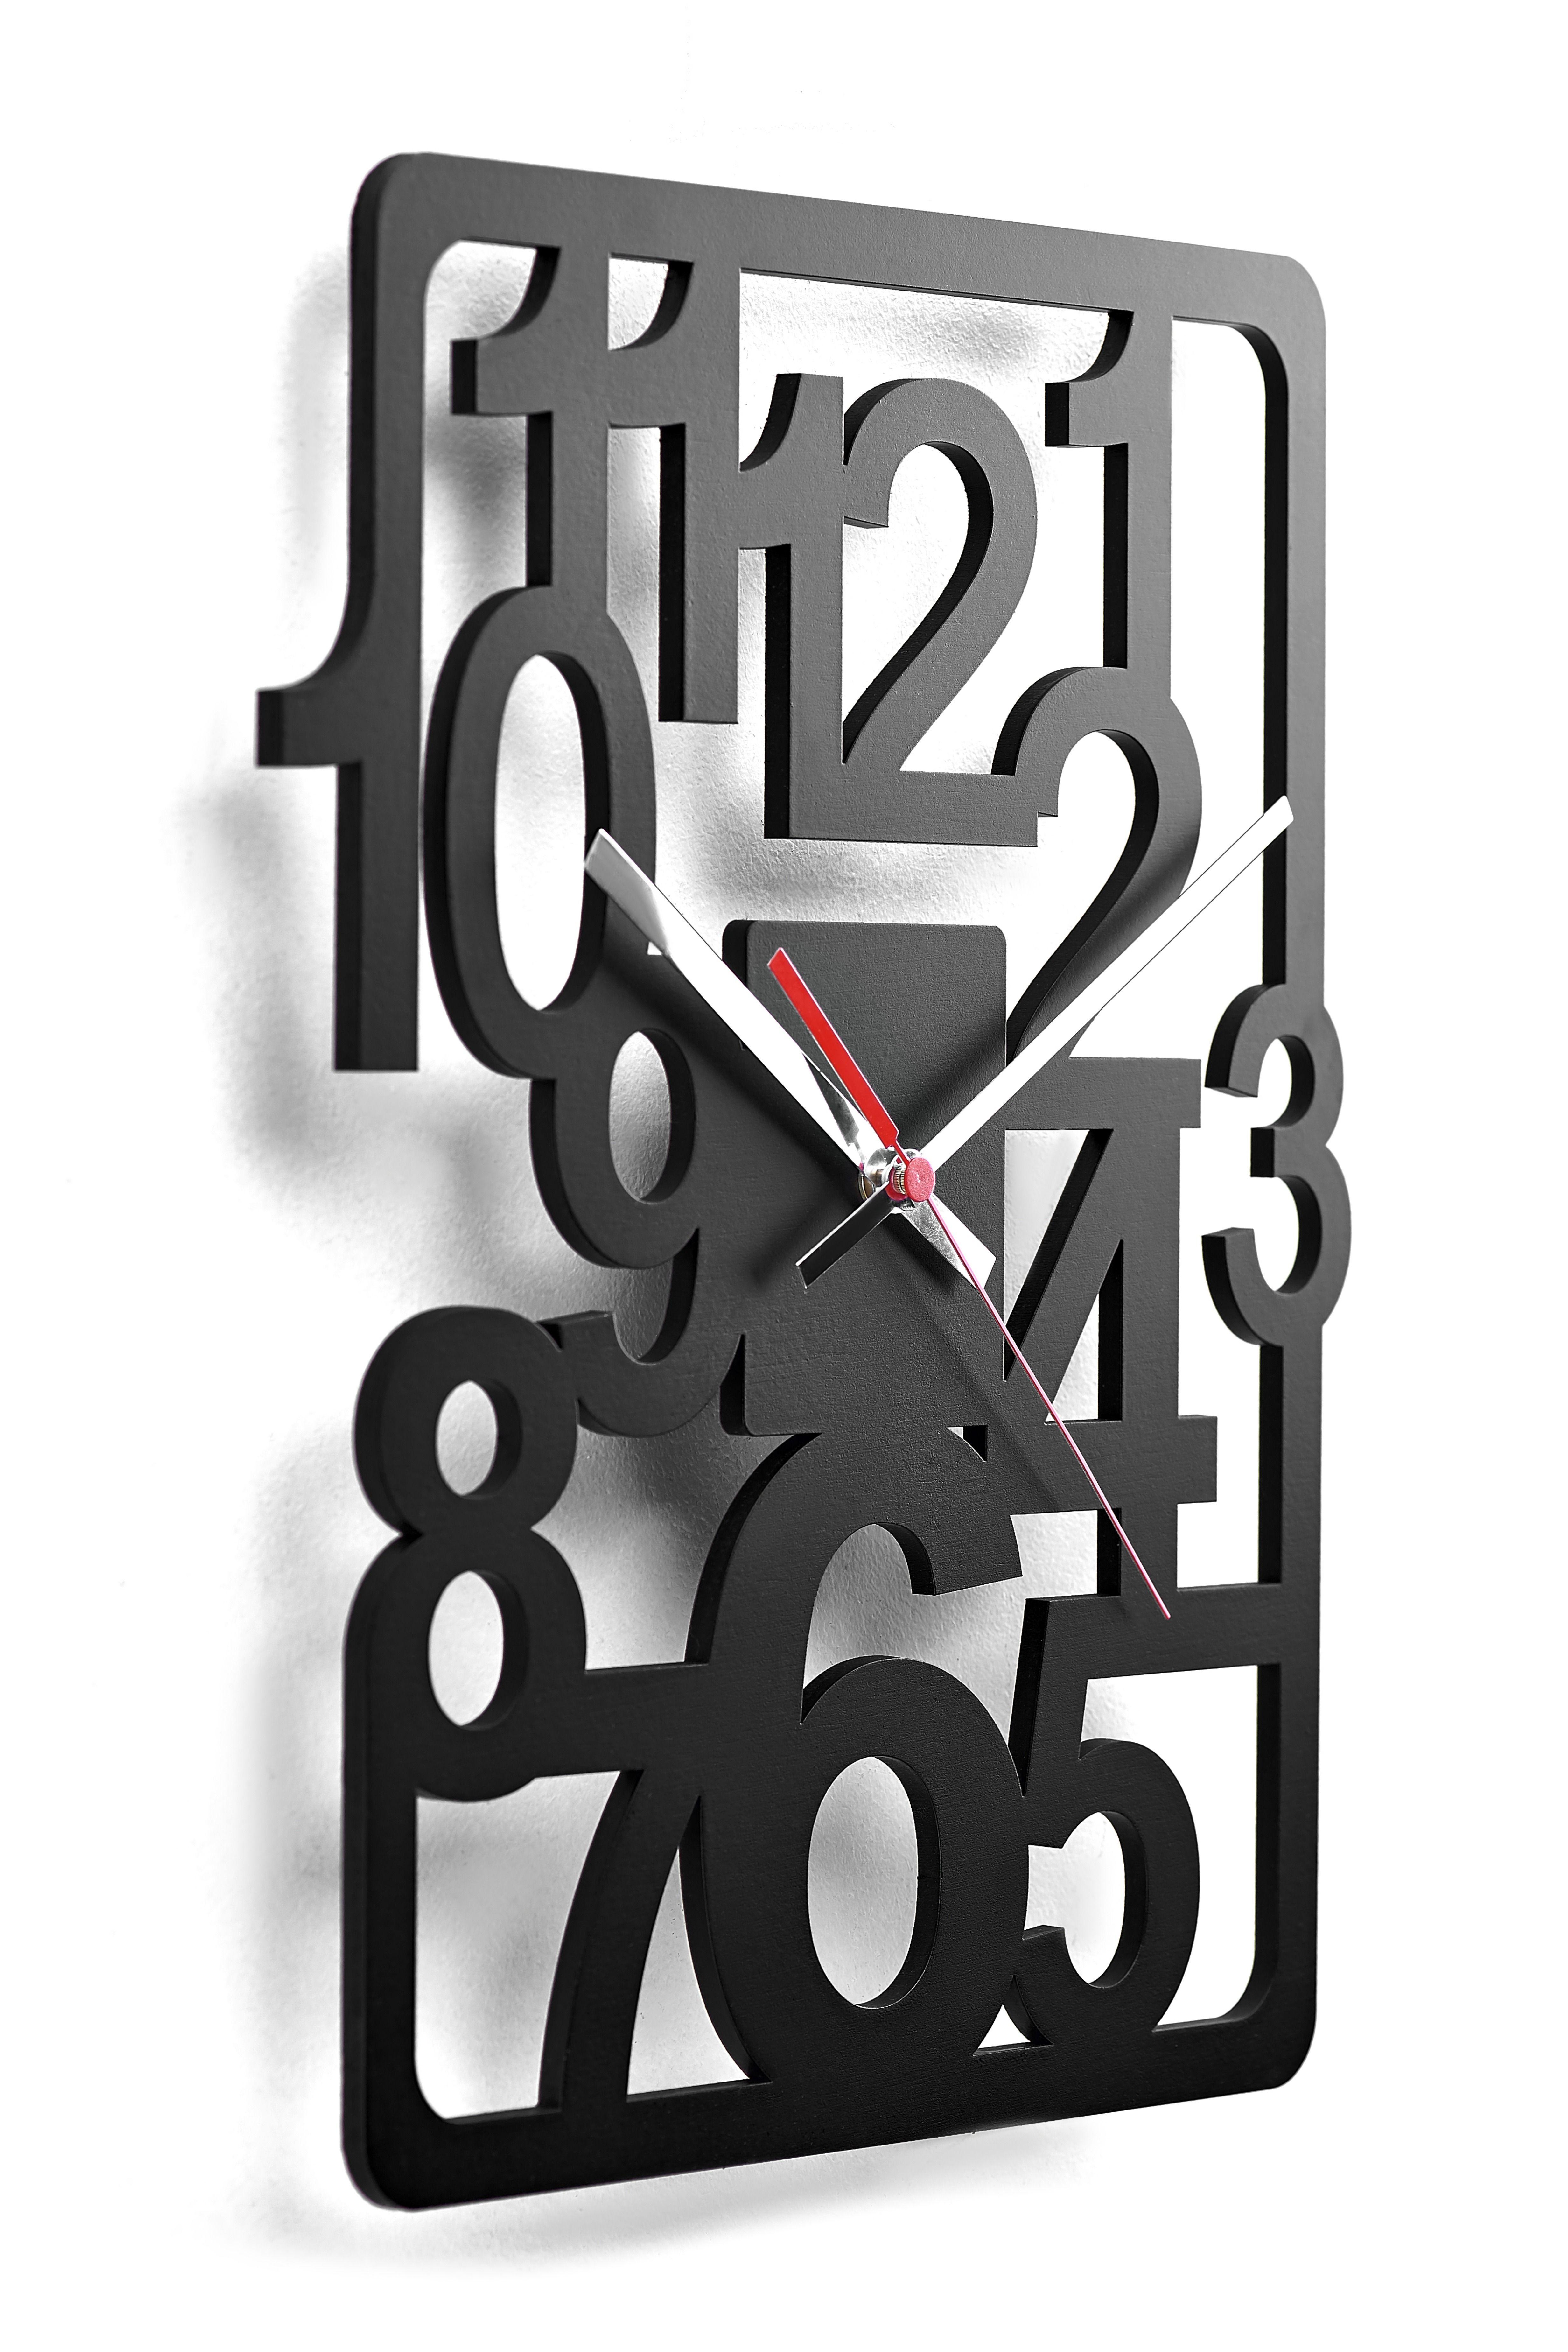 Modern Wall Clocks For Office